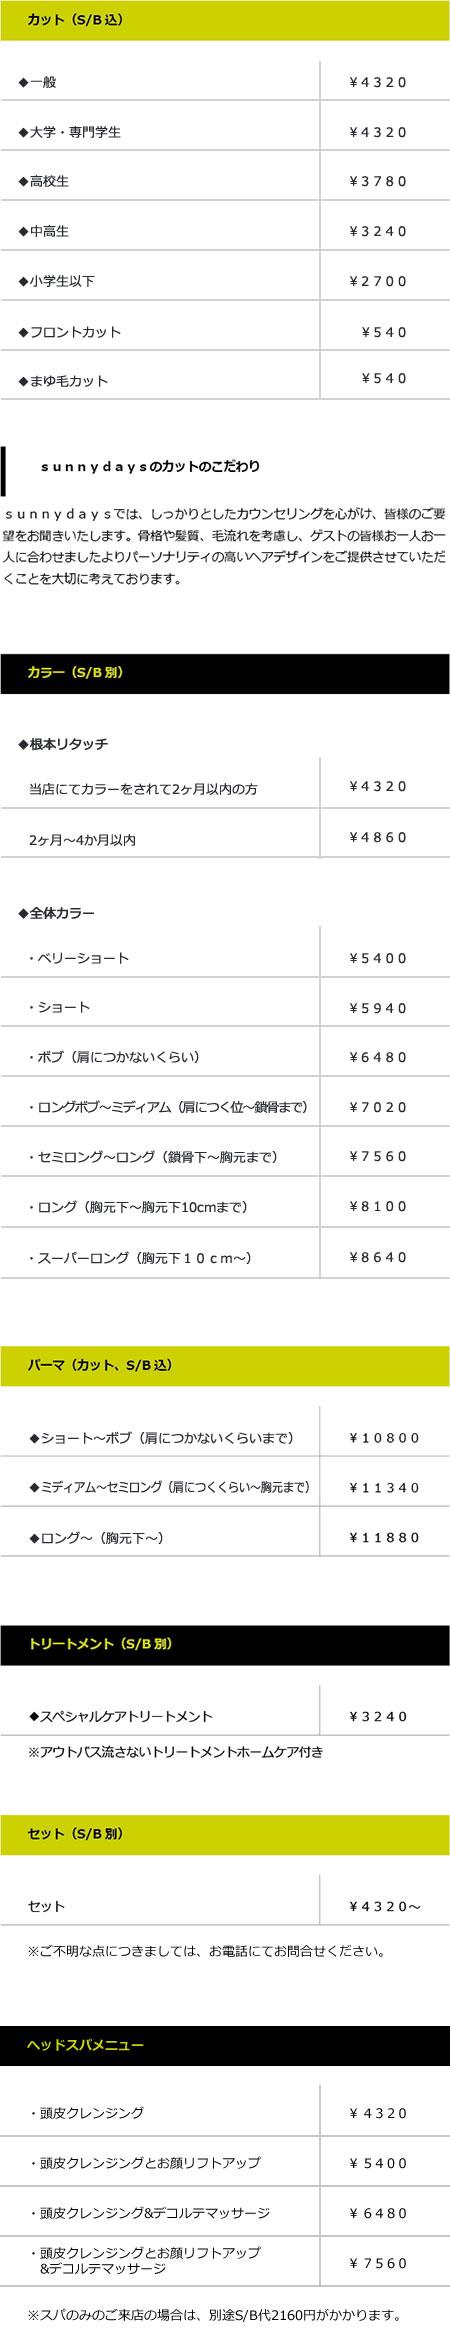 price_r_03